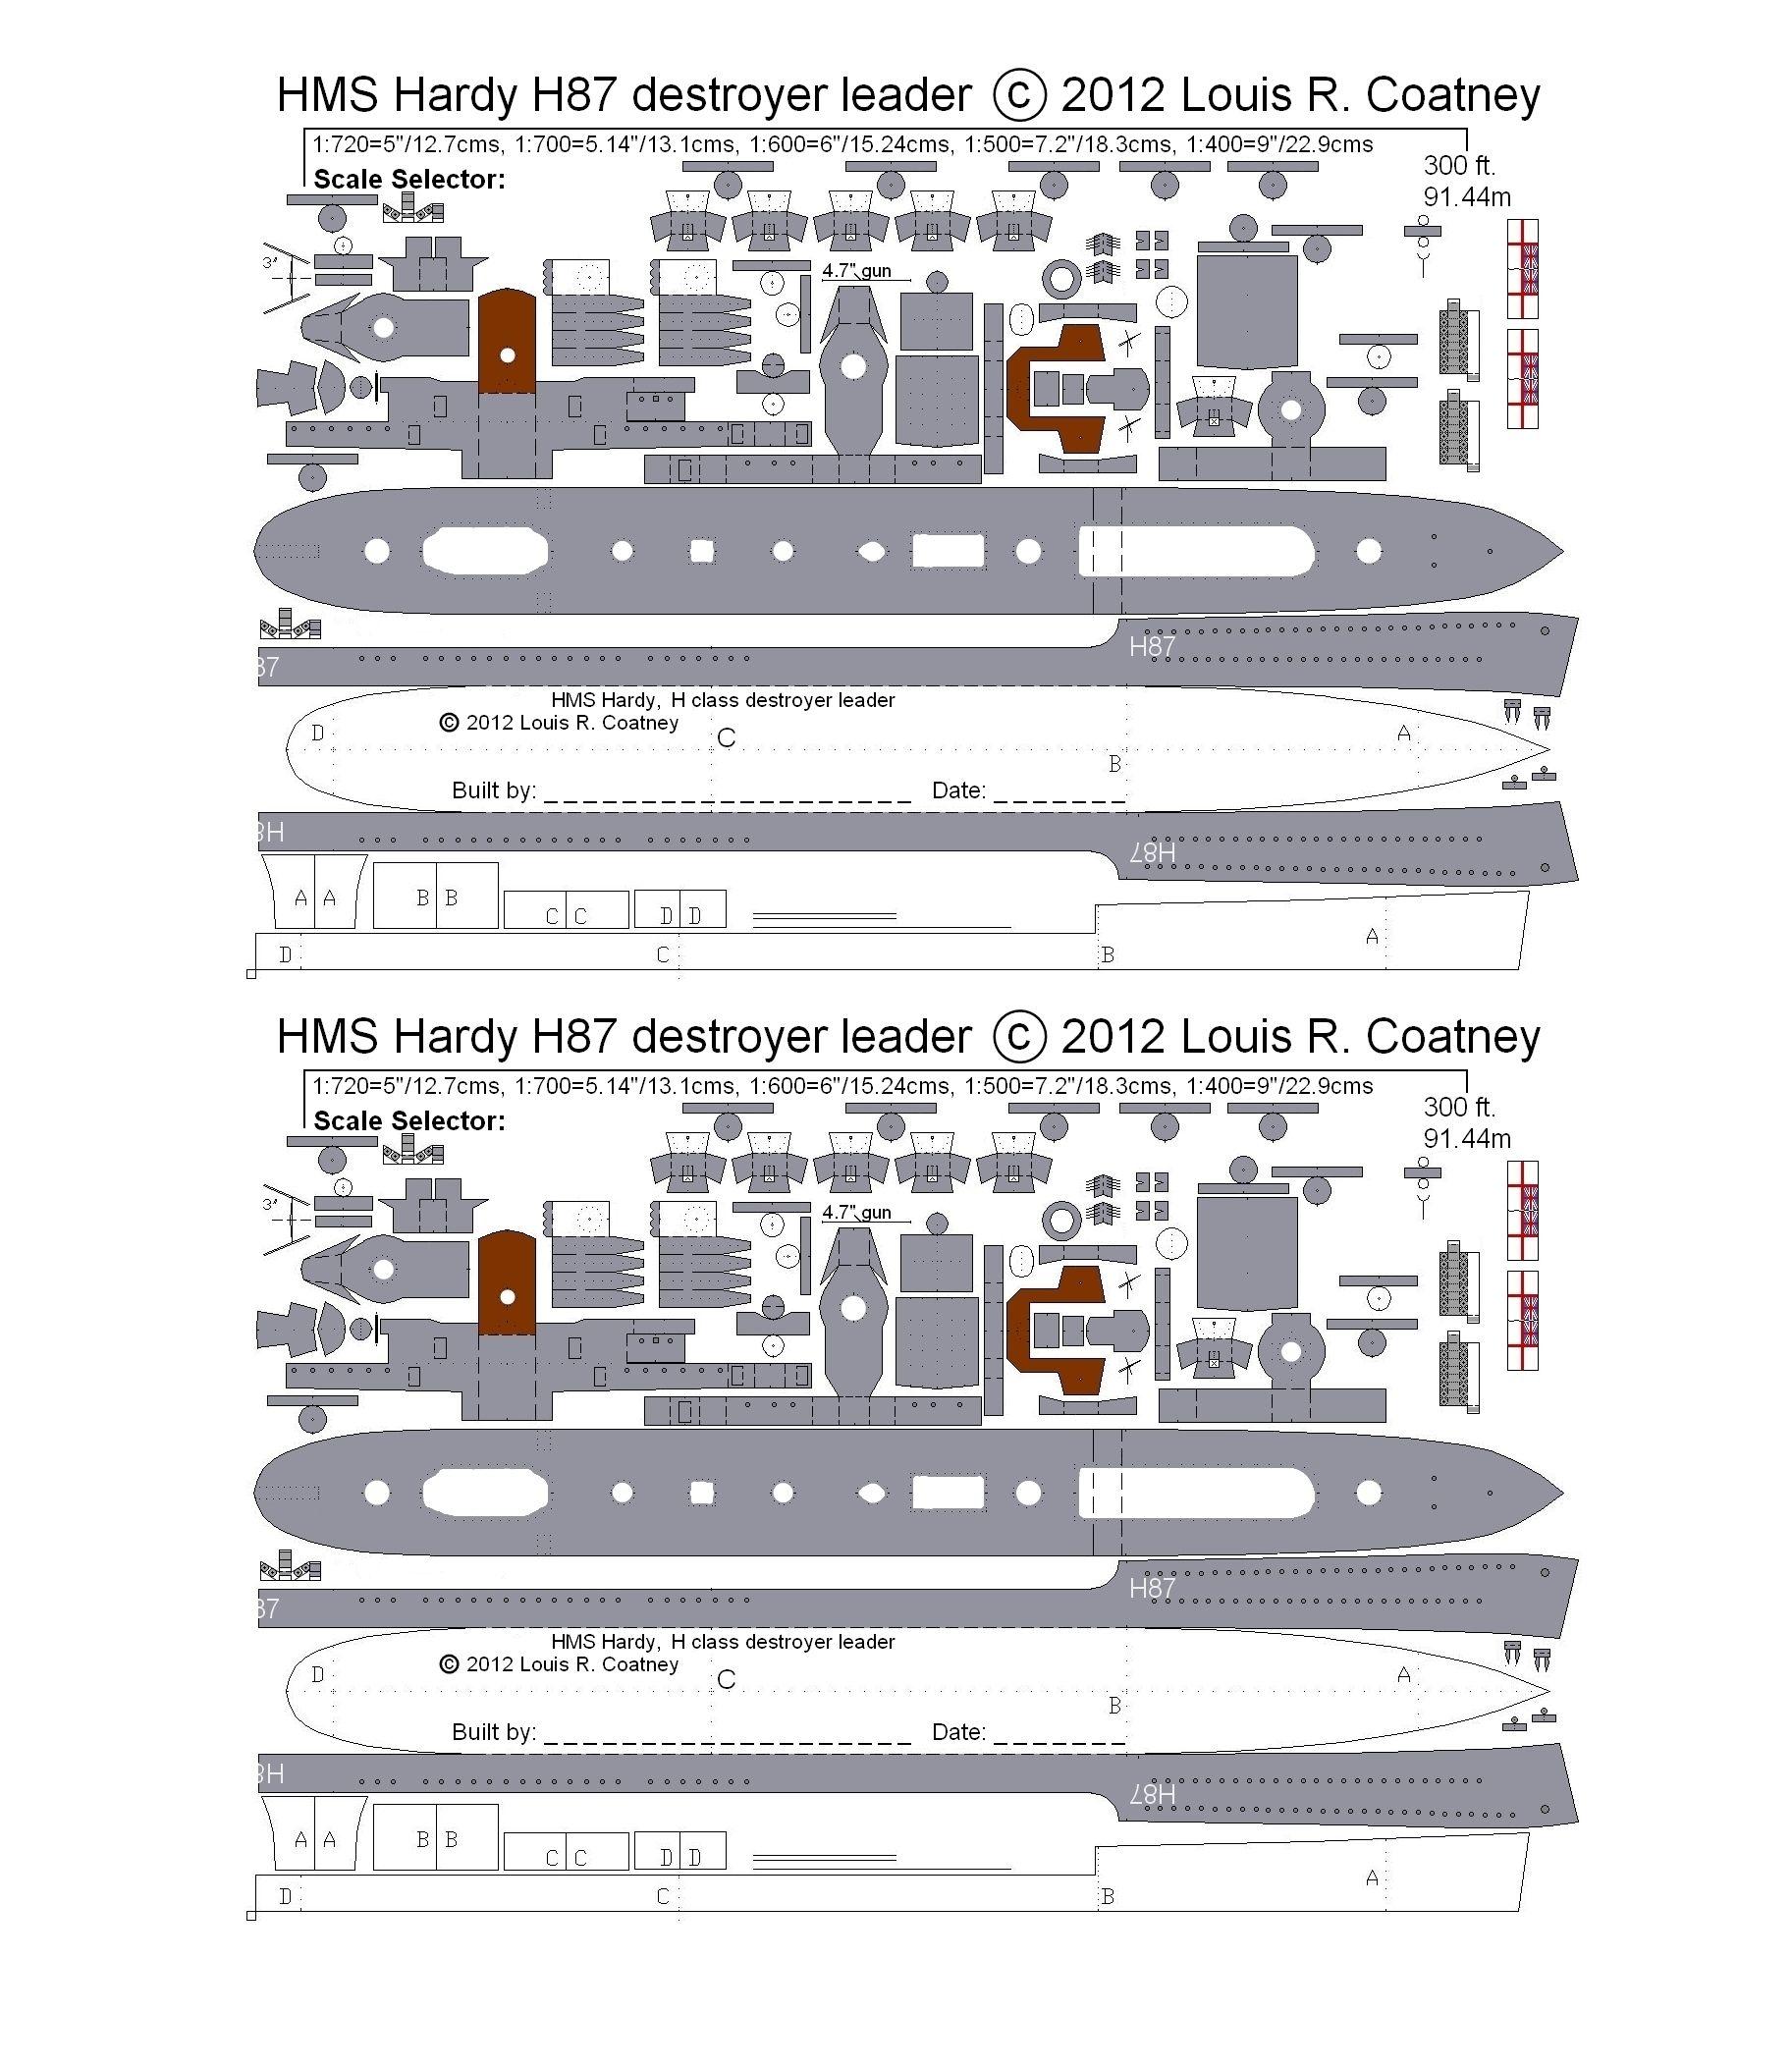 Http Www Coatneyhistory Com Hardydlshadedjpg Jpg Paper Models Paper Cutout Model Ships